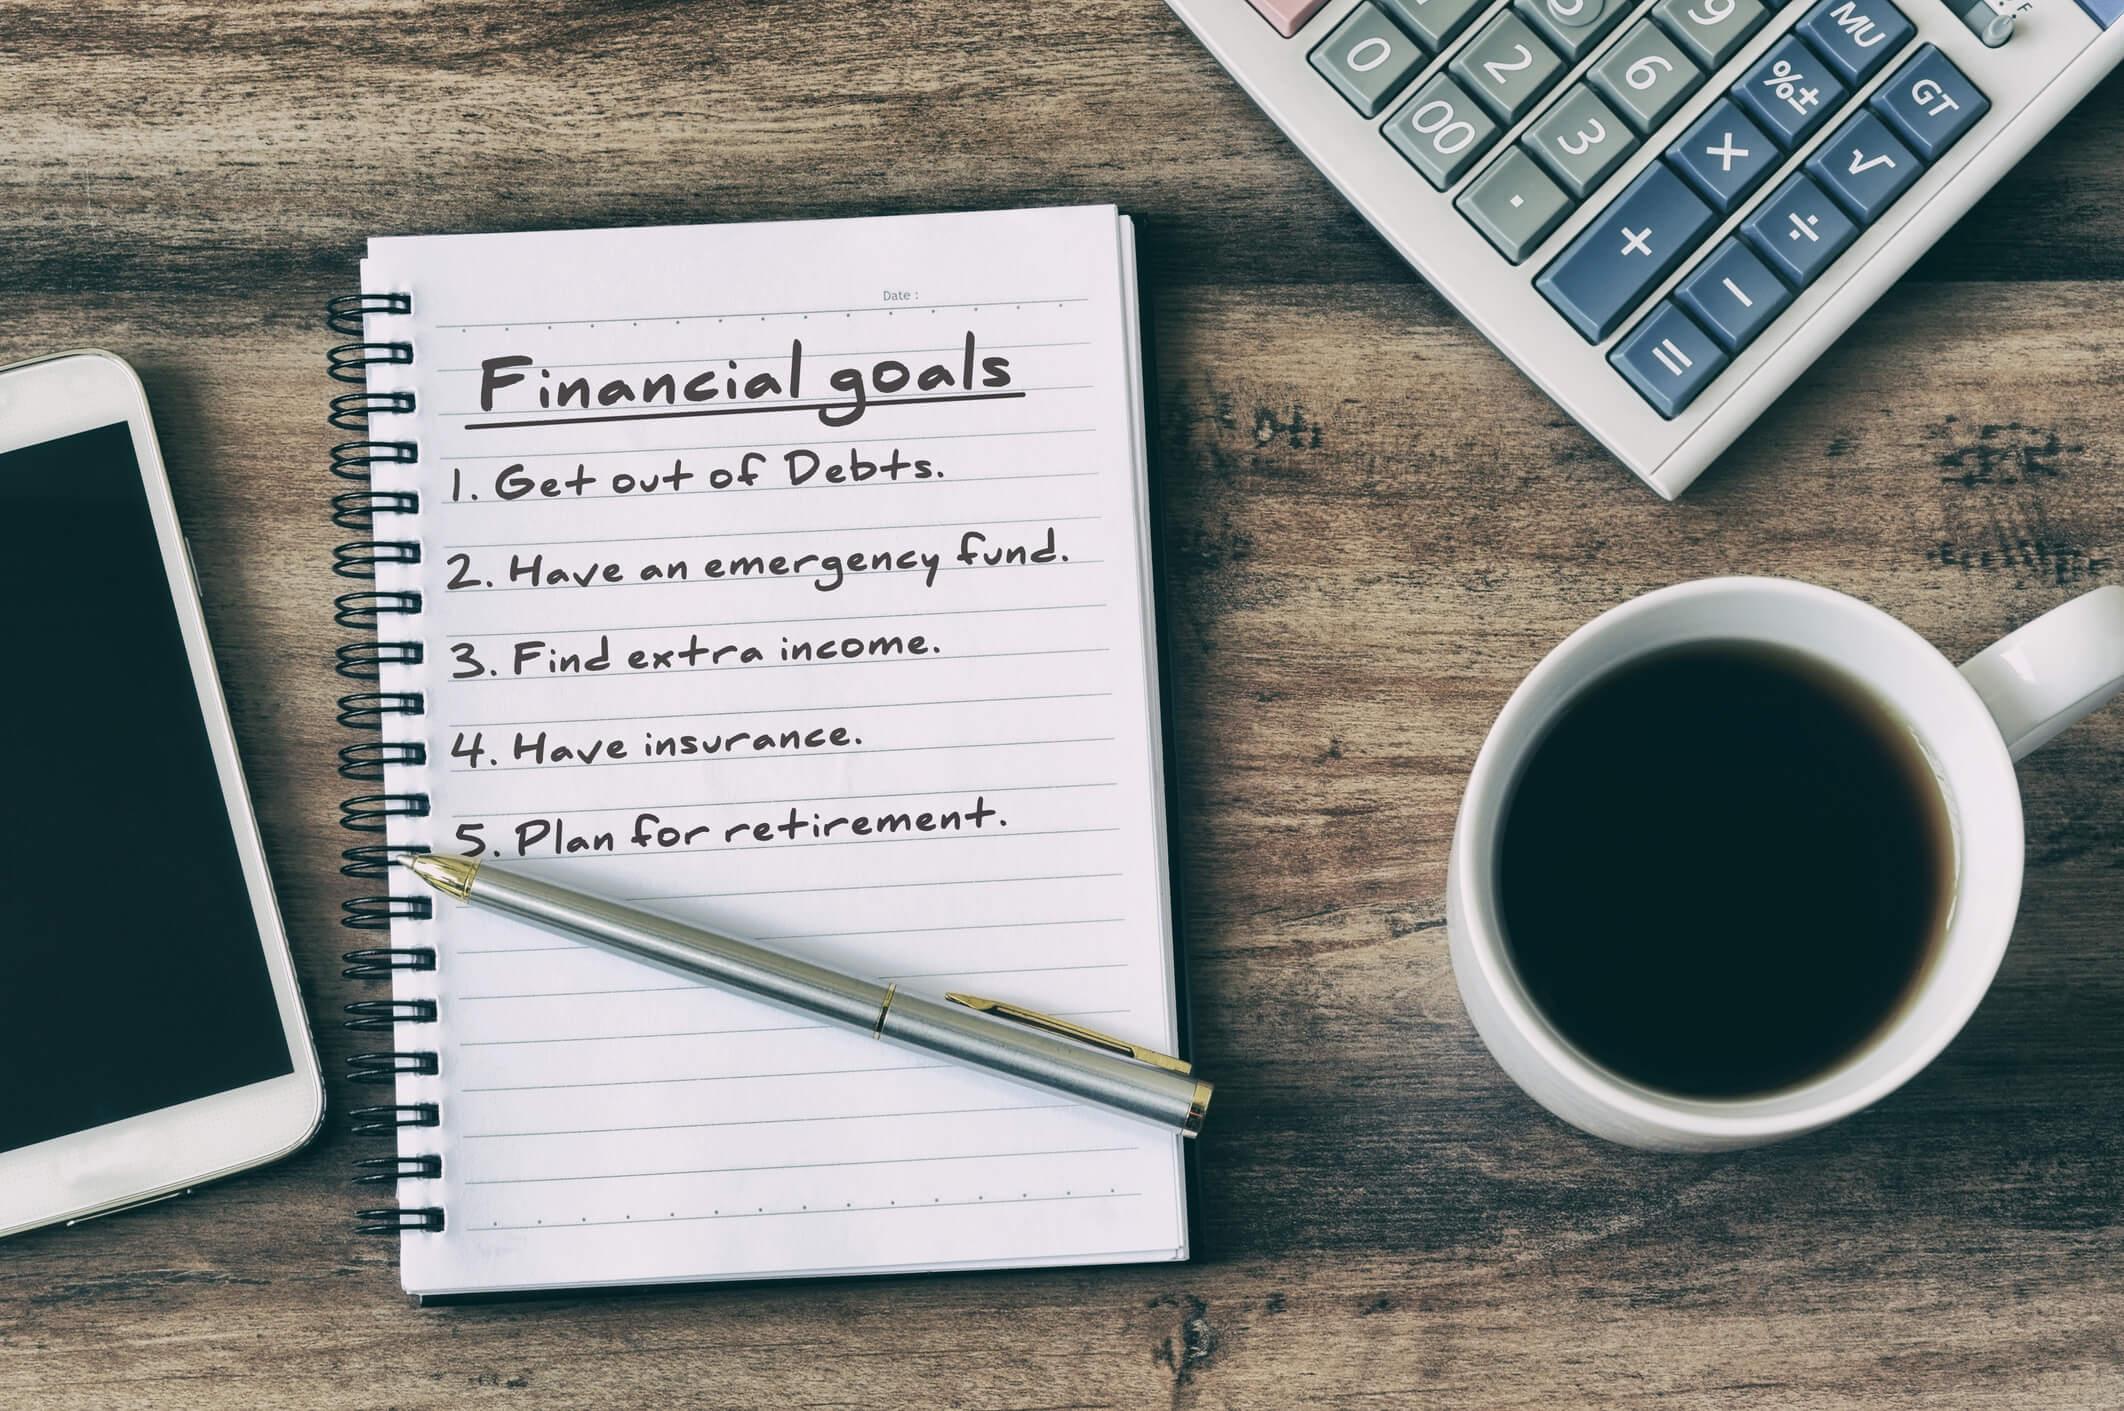 Financial Goals - Complete Controller